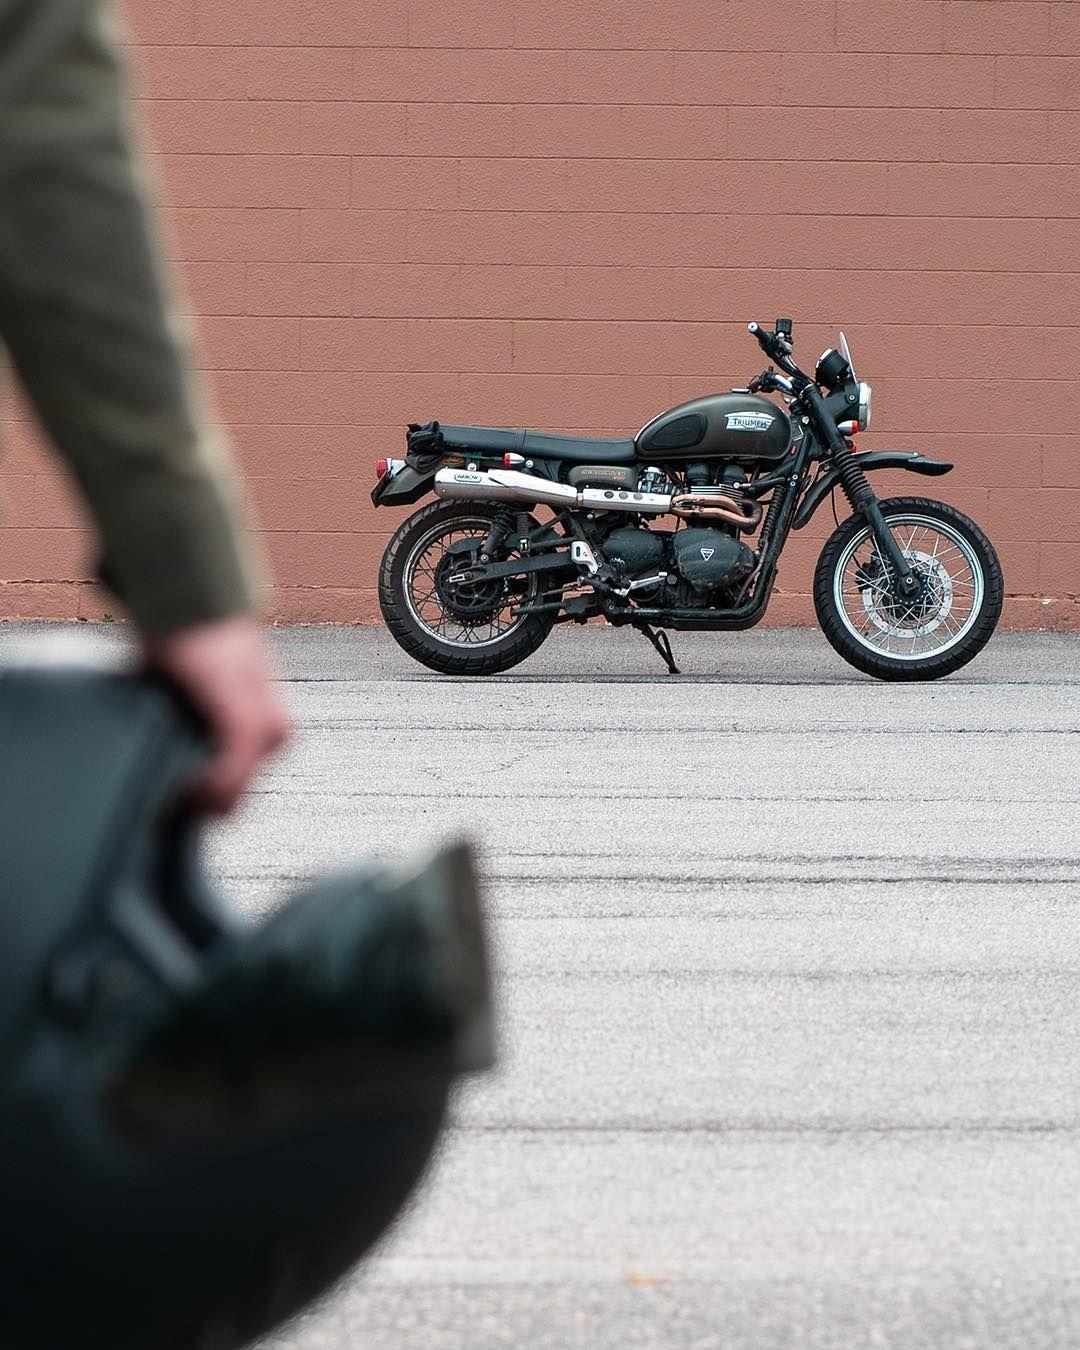 Moto Zuc Motorcycles Design On Instagram Hello Monday Ready To